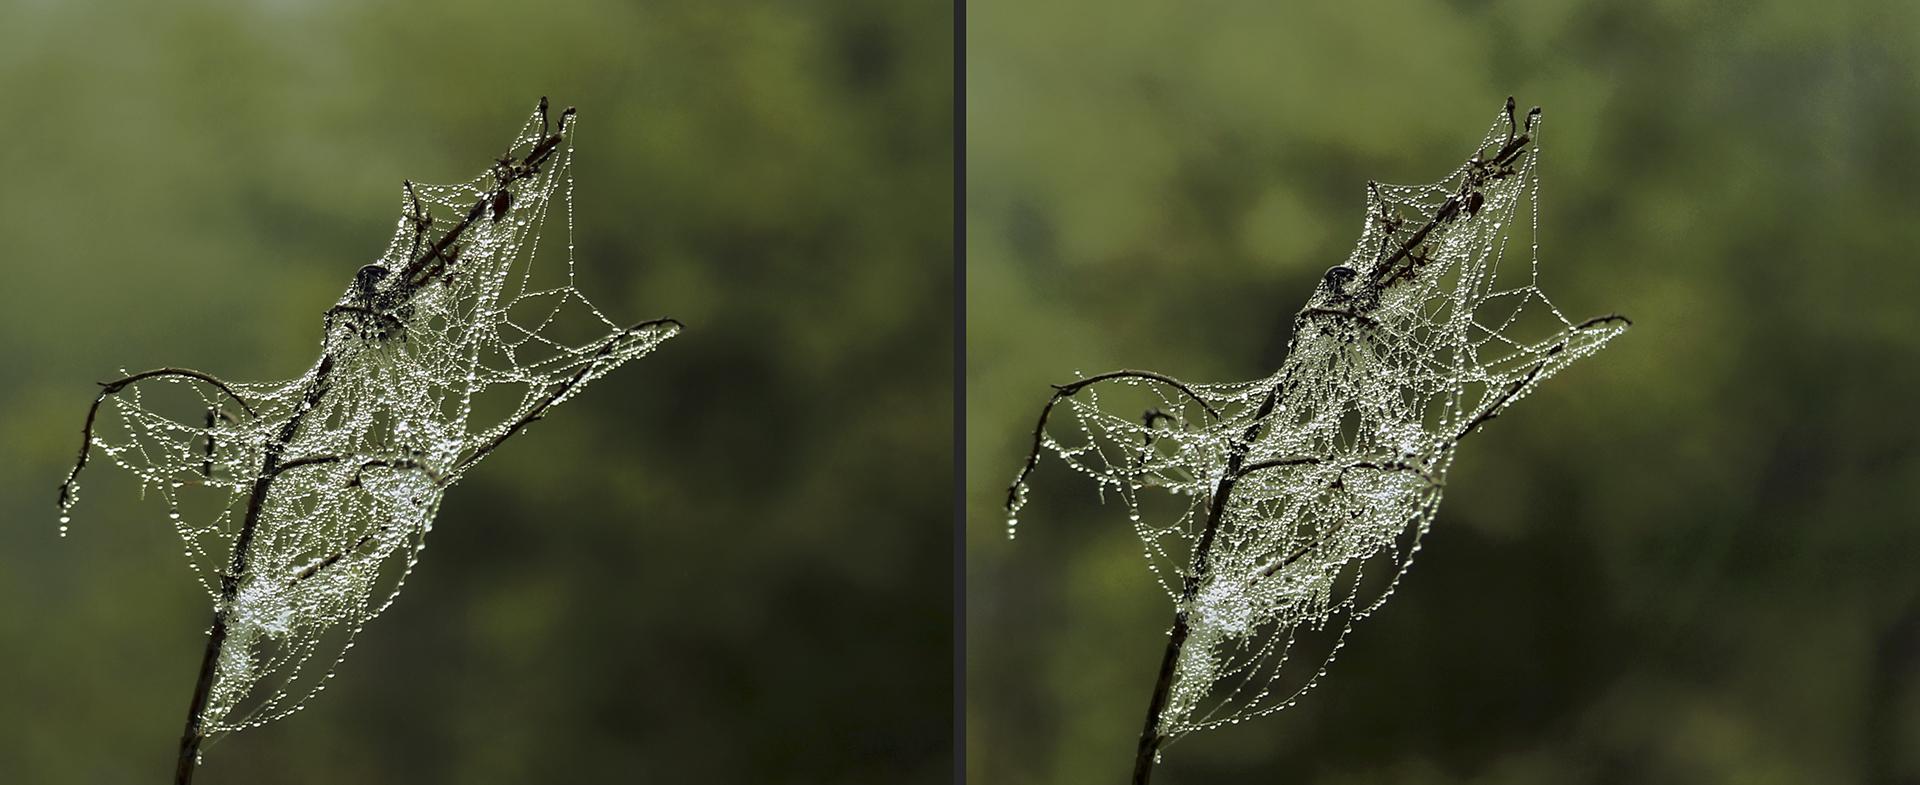 Perlenkette 2 (3D)